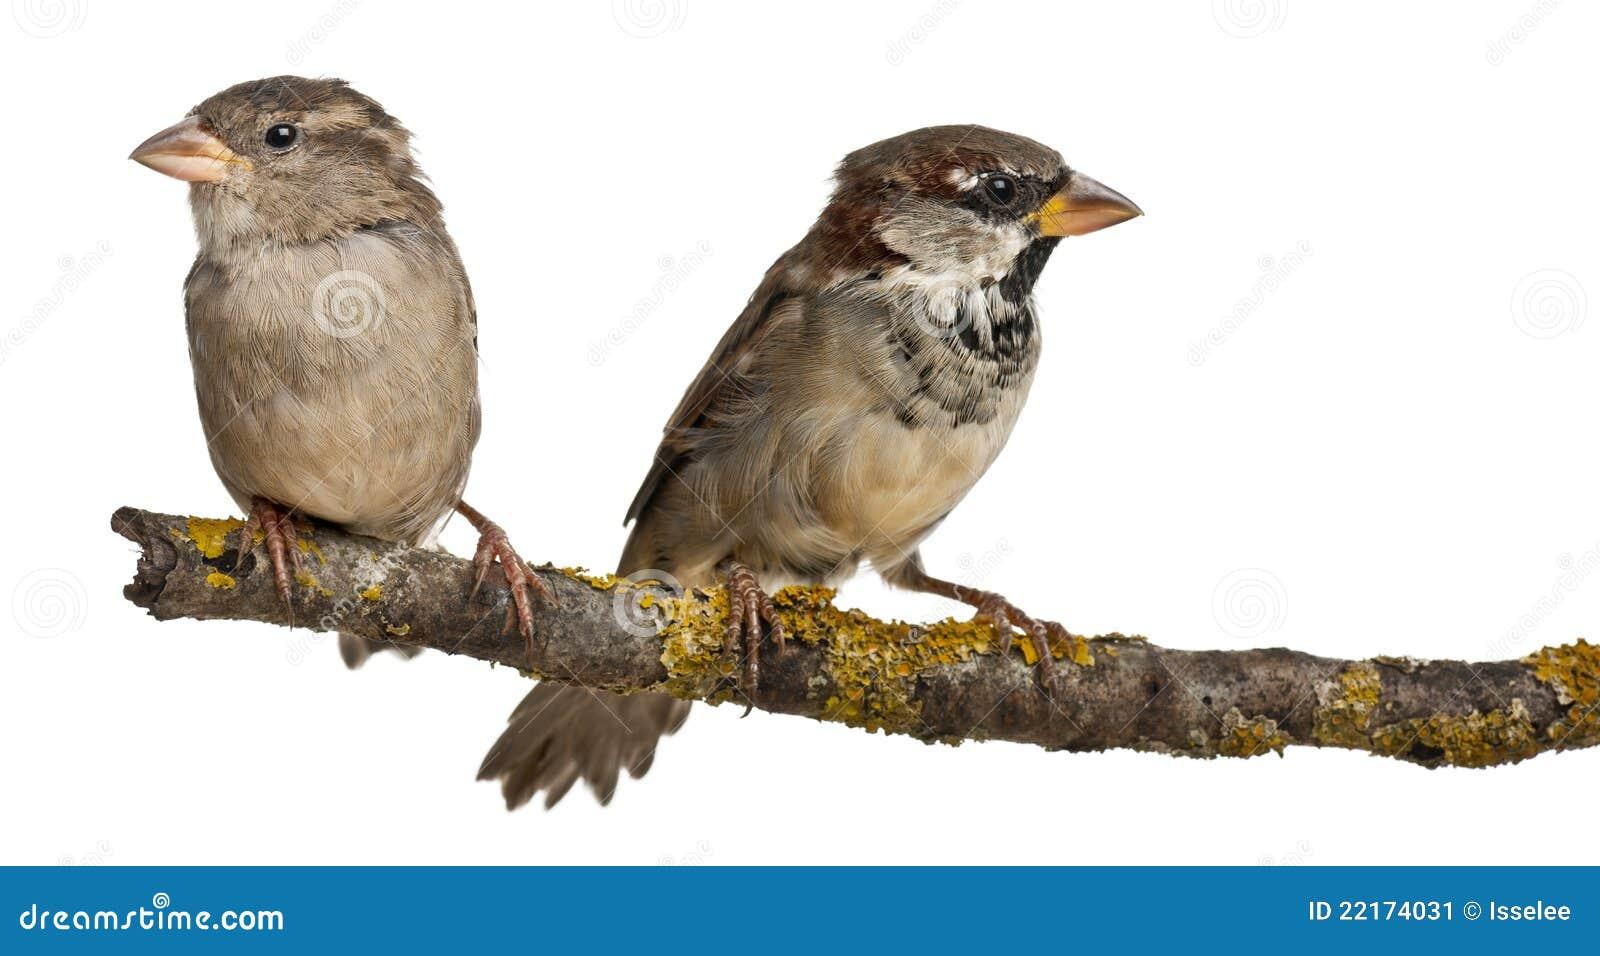 Female house sparrows